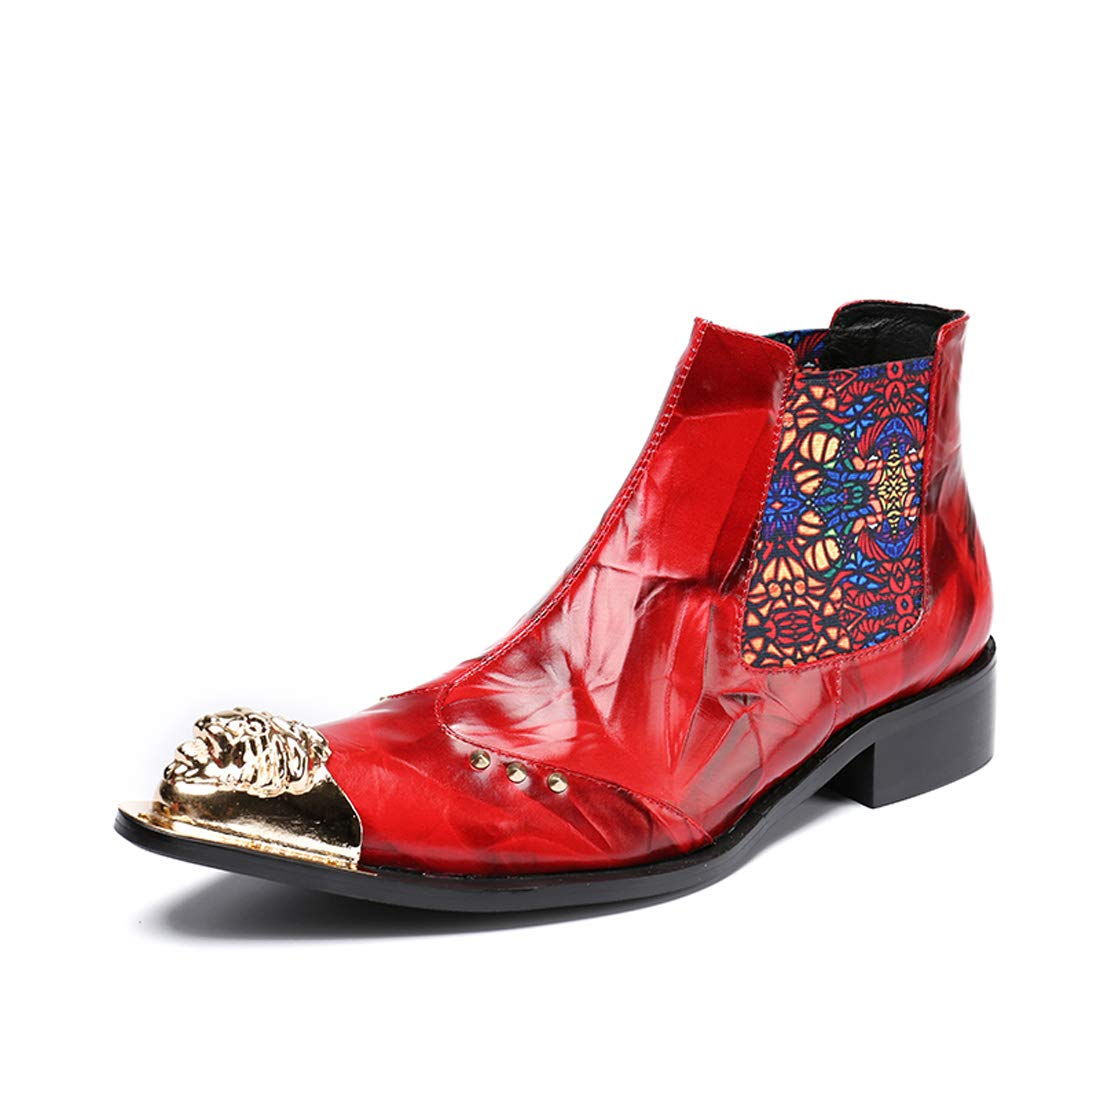 DANDANJIE Herren Formelle Schuhe Leder Herbst Oxfords rot Party & Abend Neuheit Schuhe